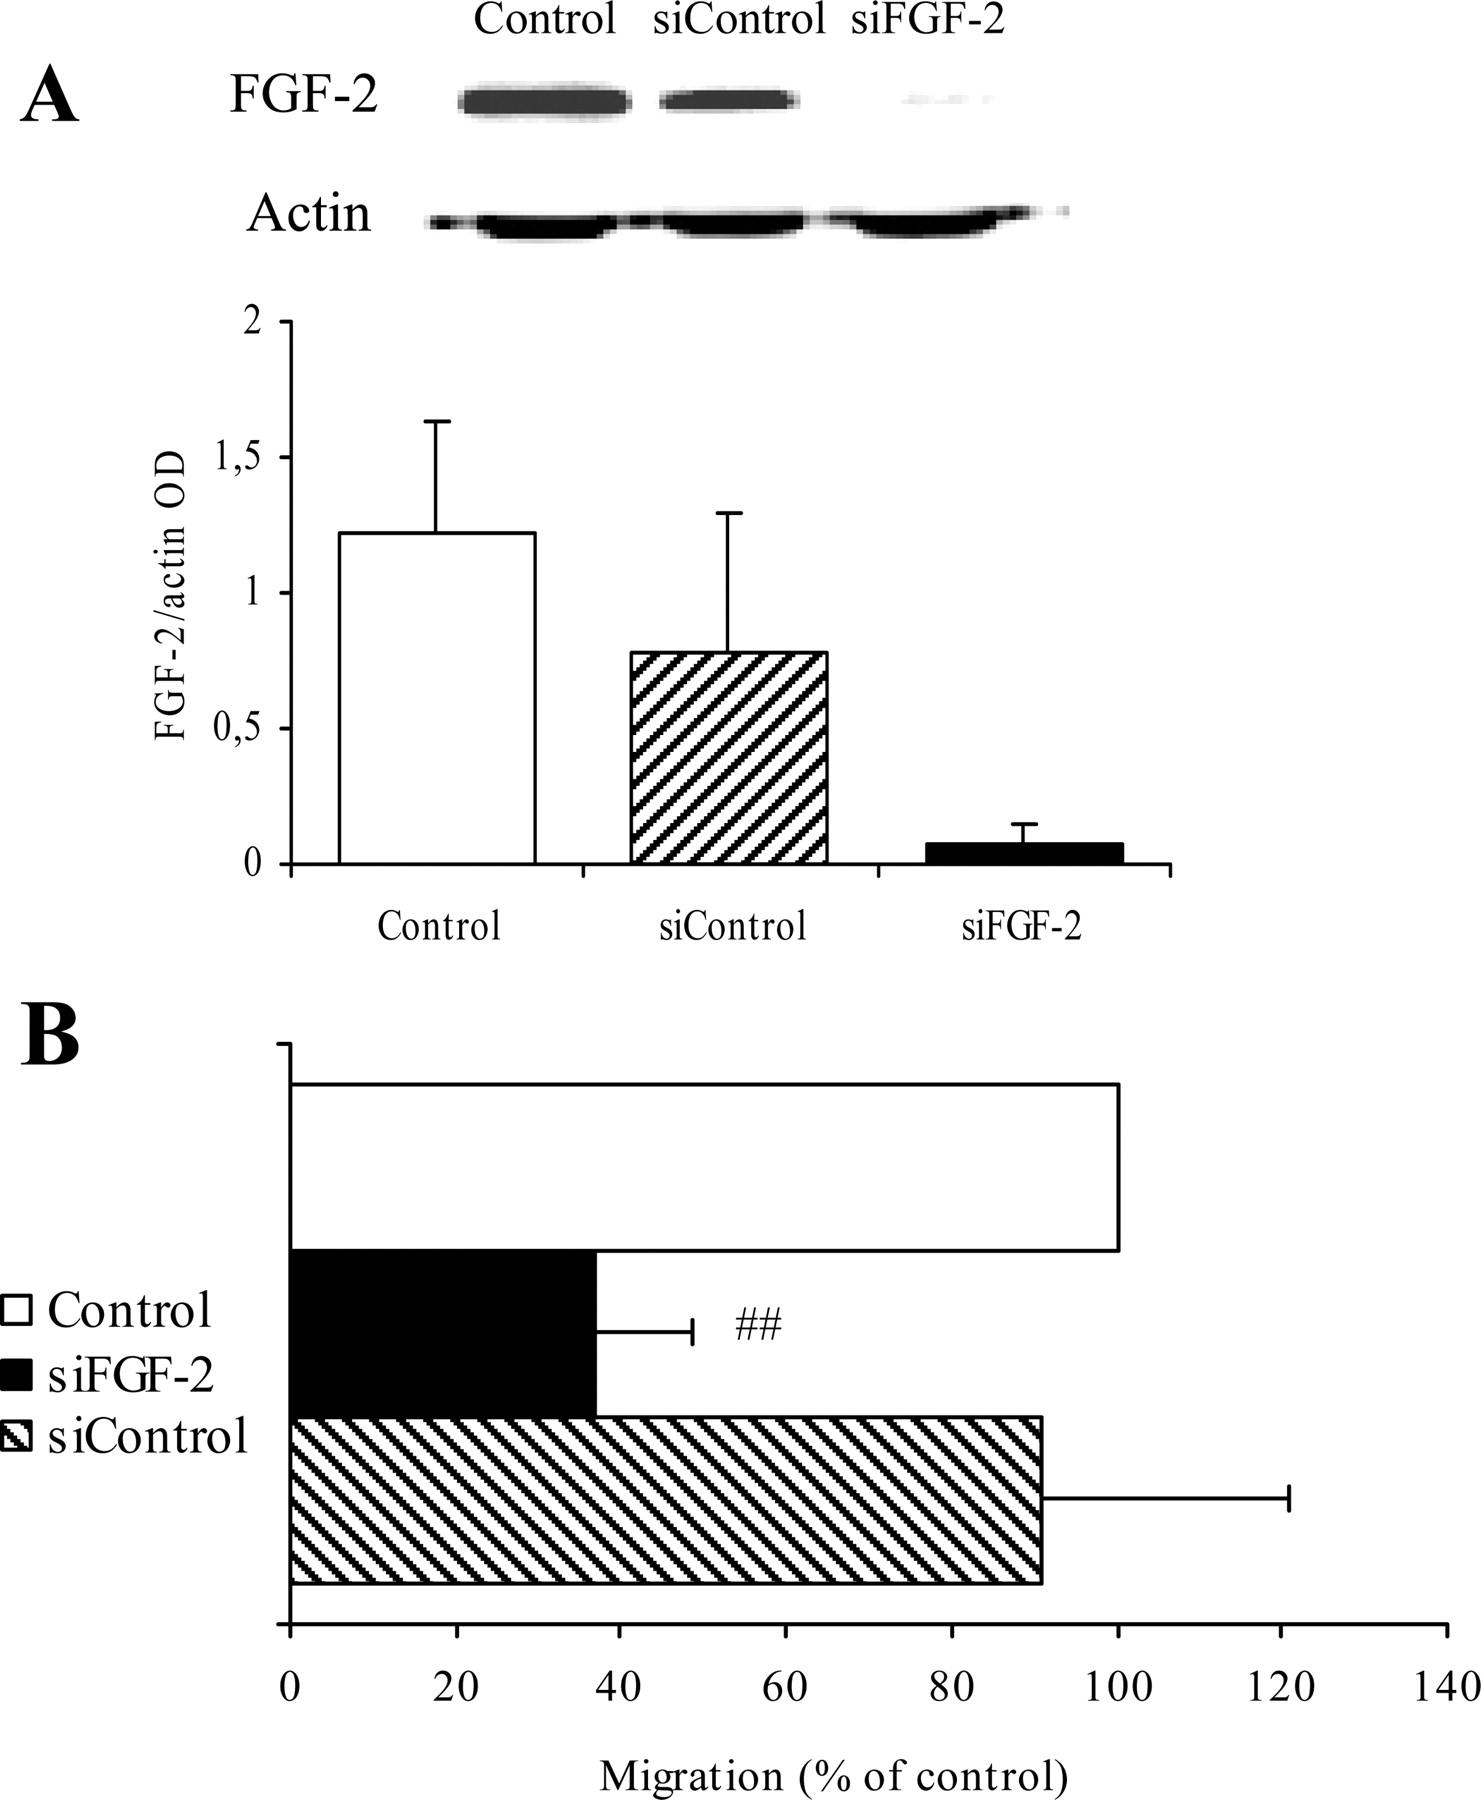 Fibroblast Growth Factor 2 Mediates Angiotensin Converting Enzyme